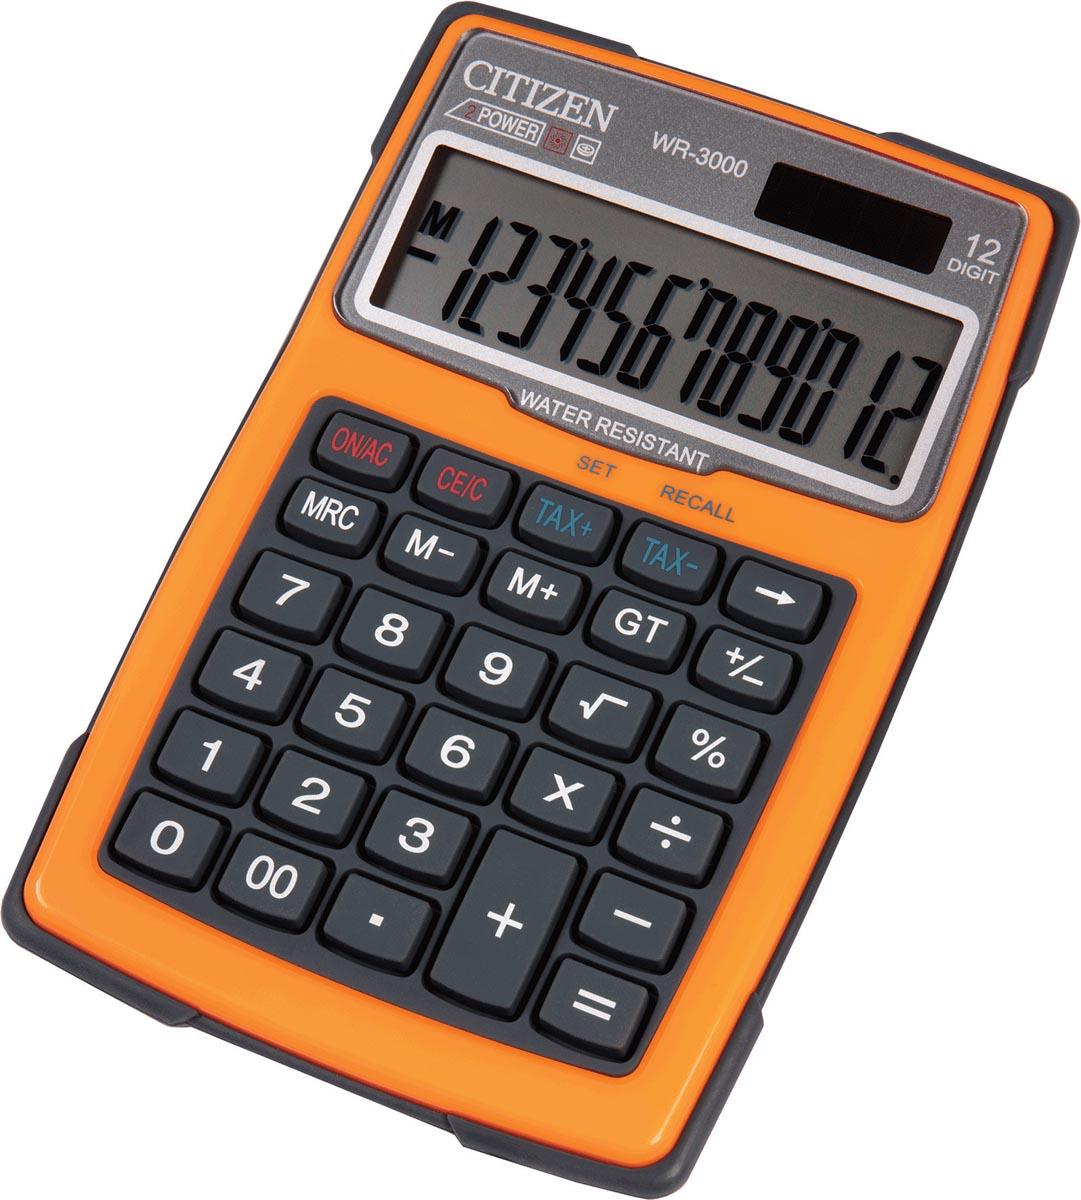 Citizen robuuste rekenmachine WR3000, water- en stofbestendig, oranje